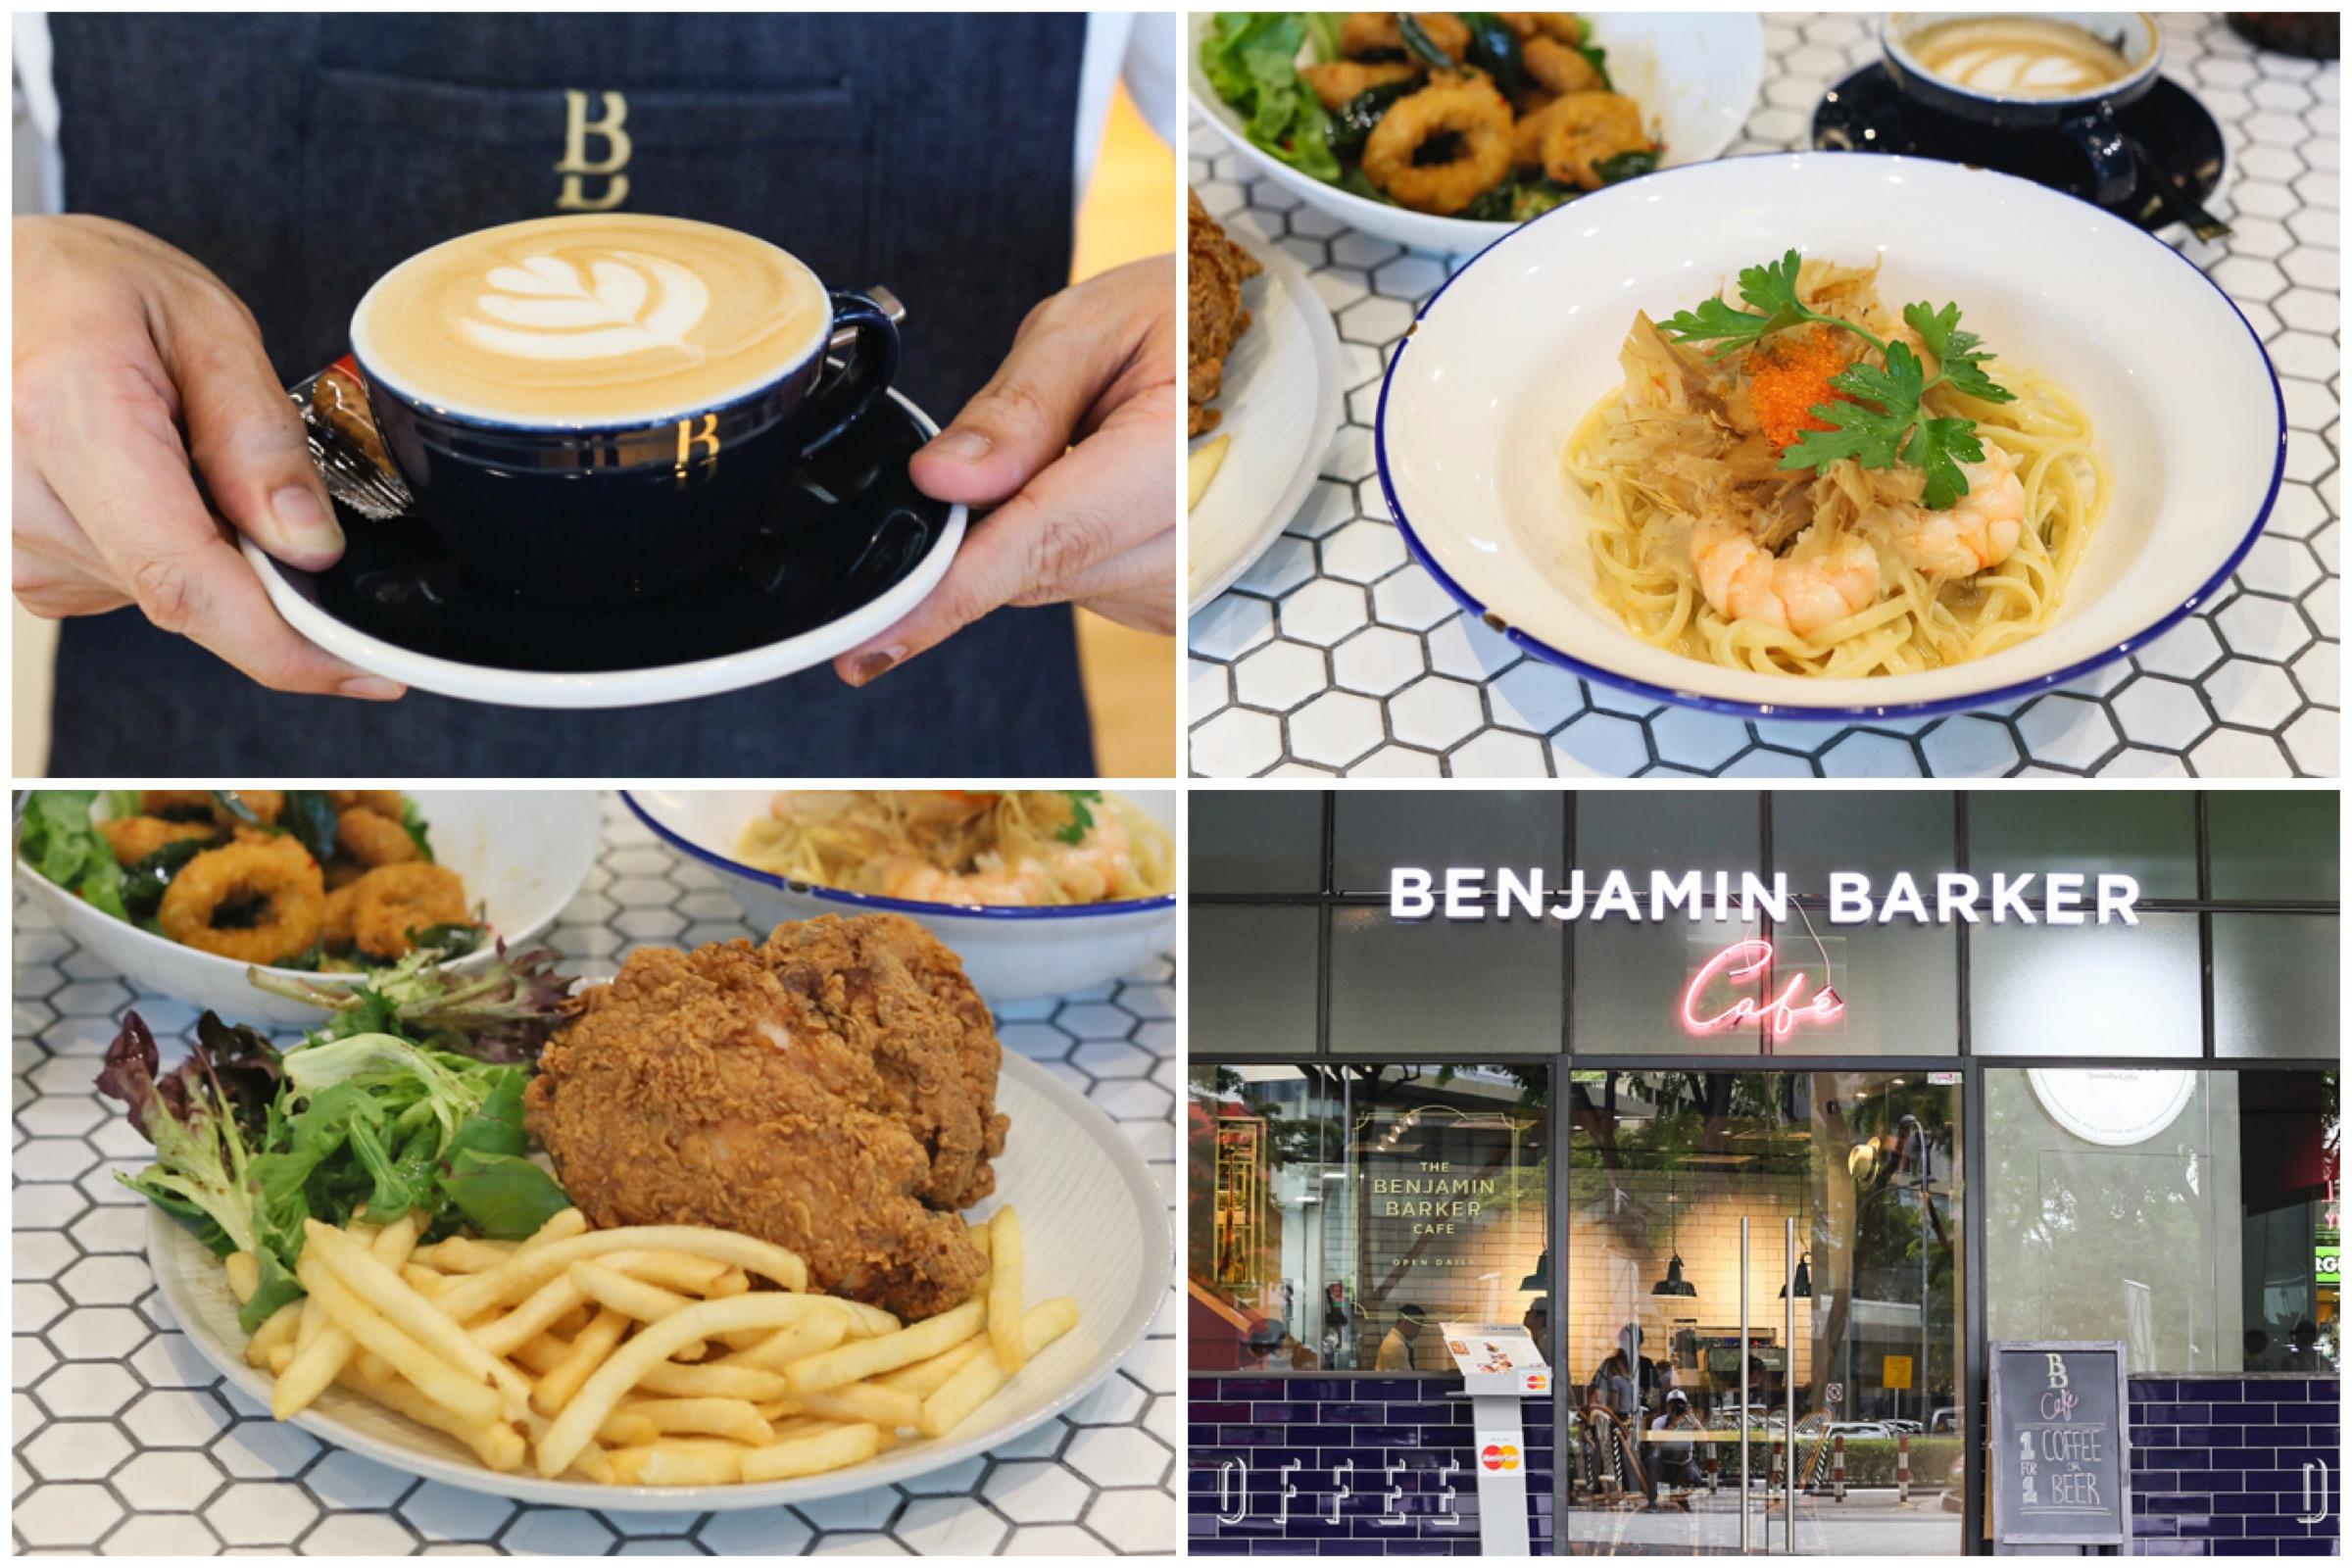 Benjamin Barker Café - Stylish Cafe By Popular Menswear Label, At Orchard Cineleisure